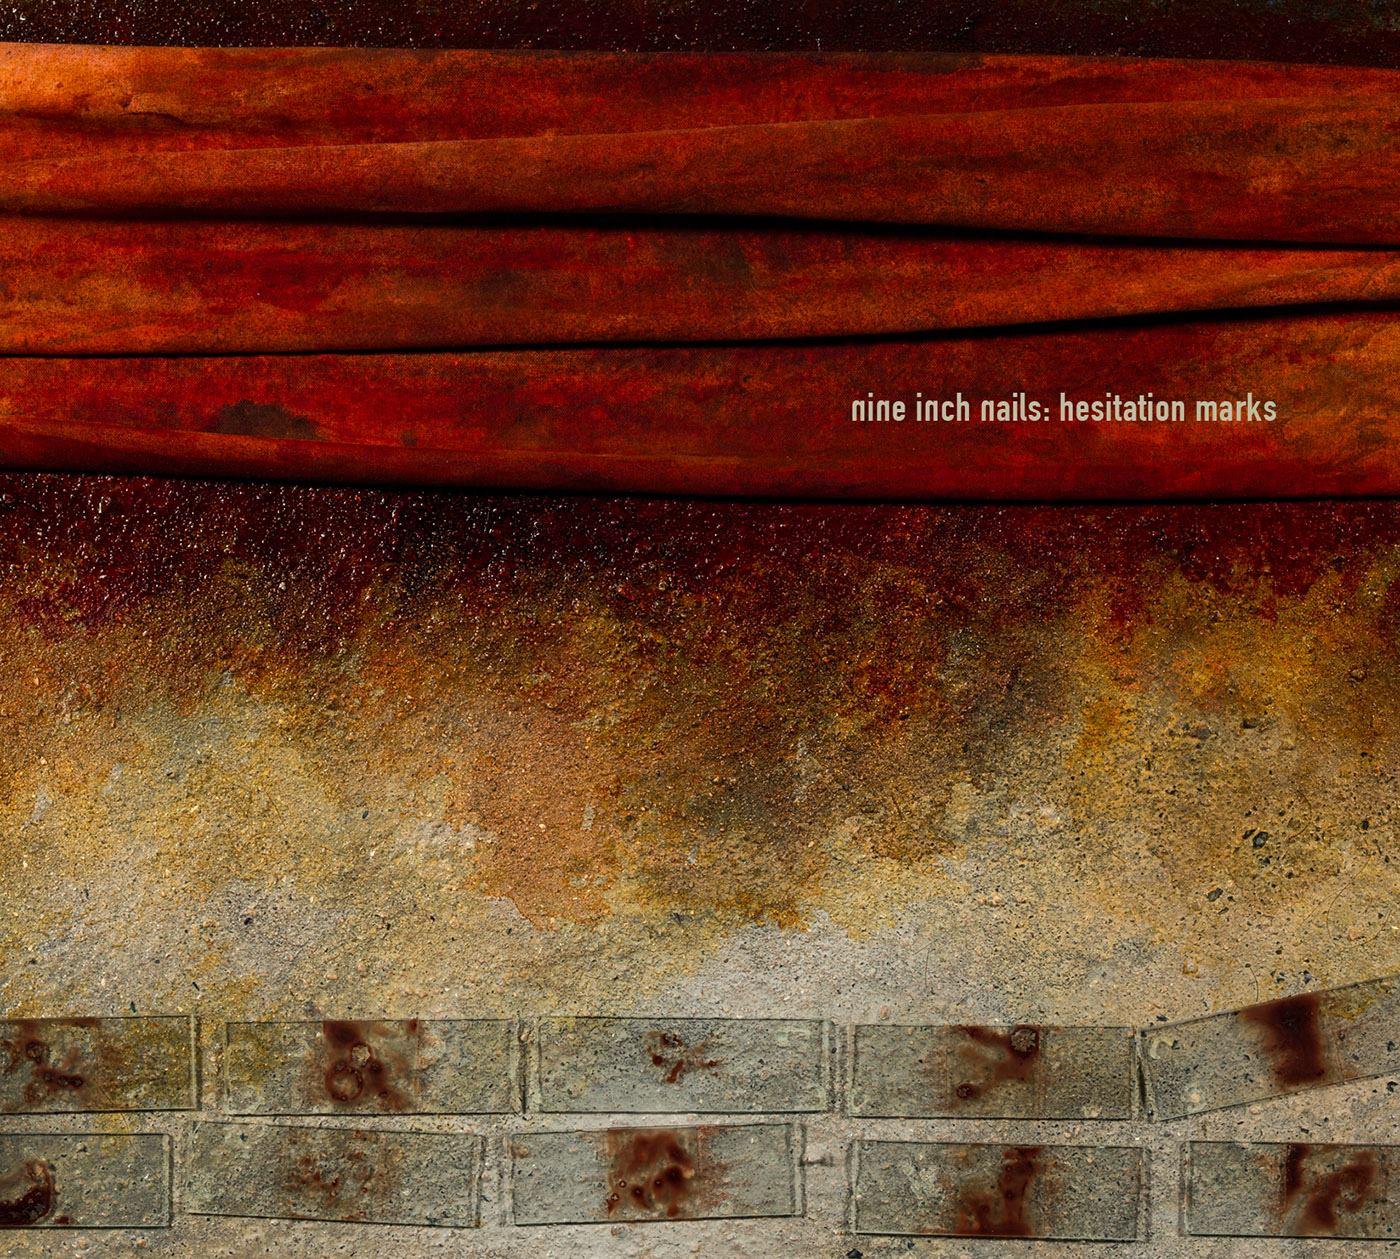 Nine Inch Nails – Hesitation Marks covers - ILLNESS ILLUSION